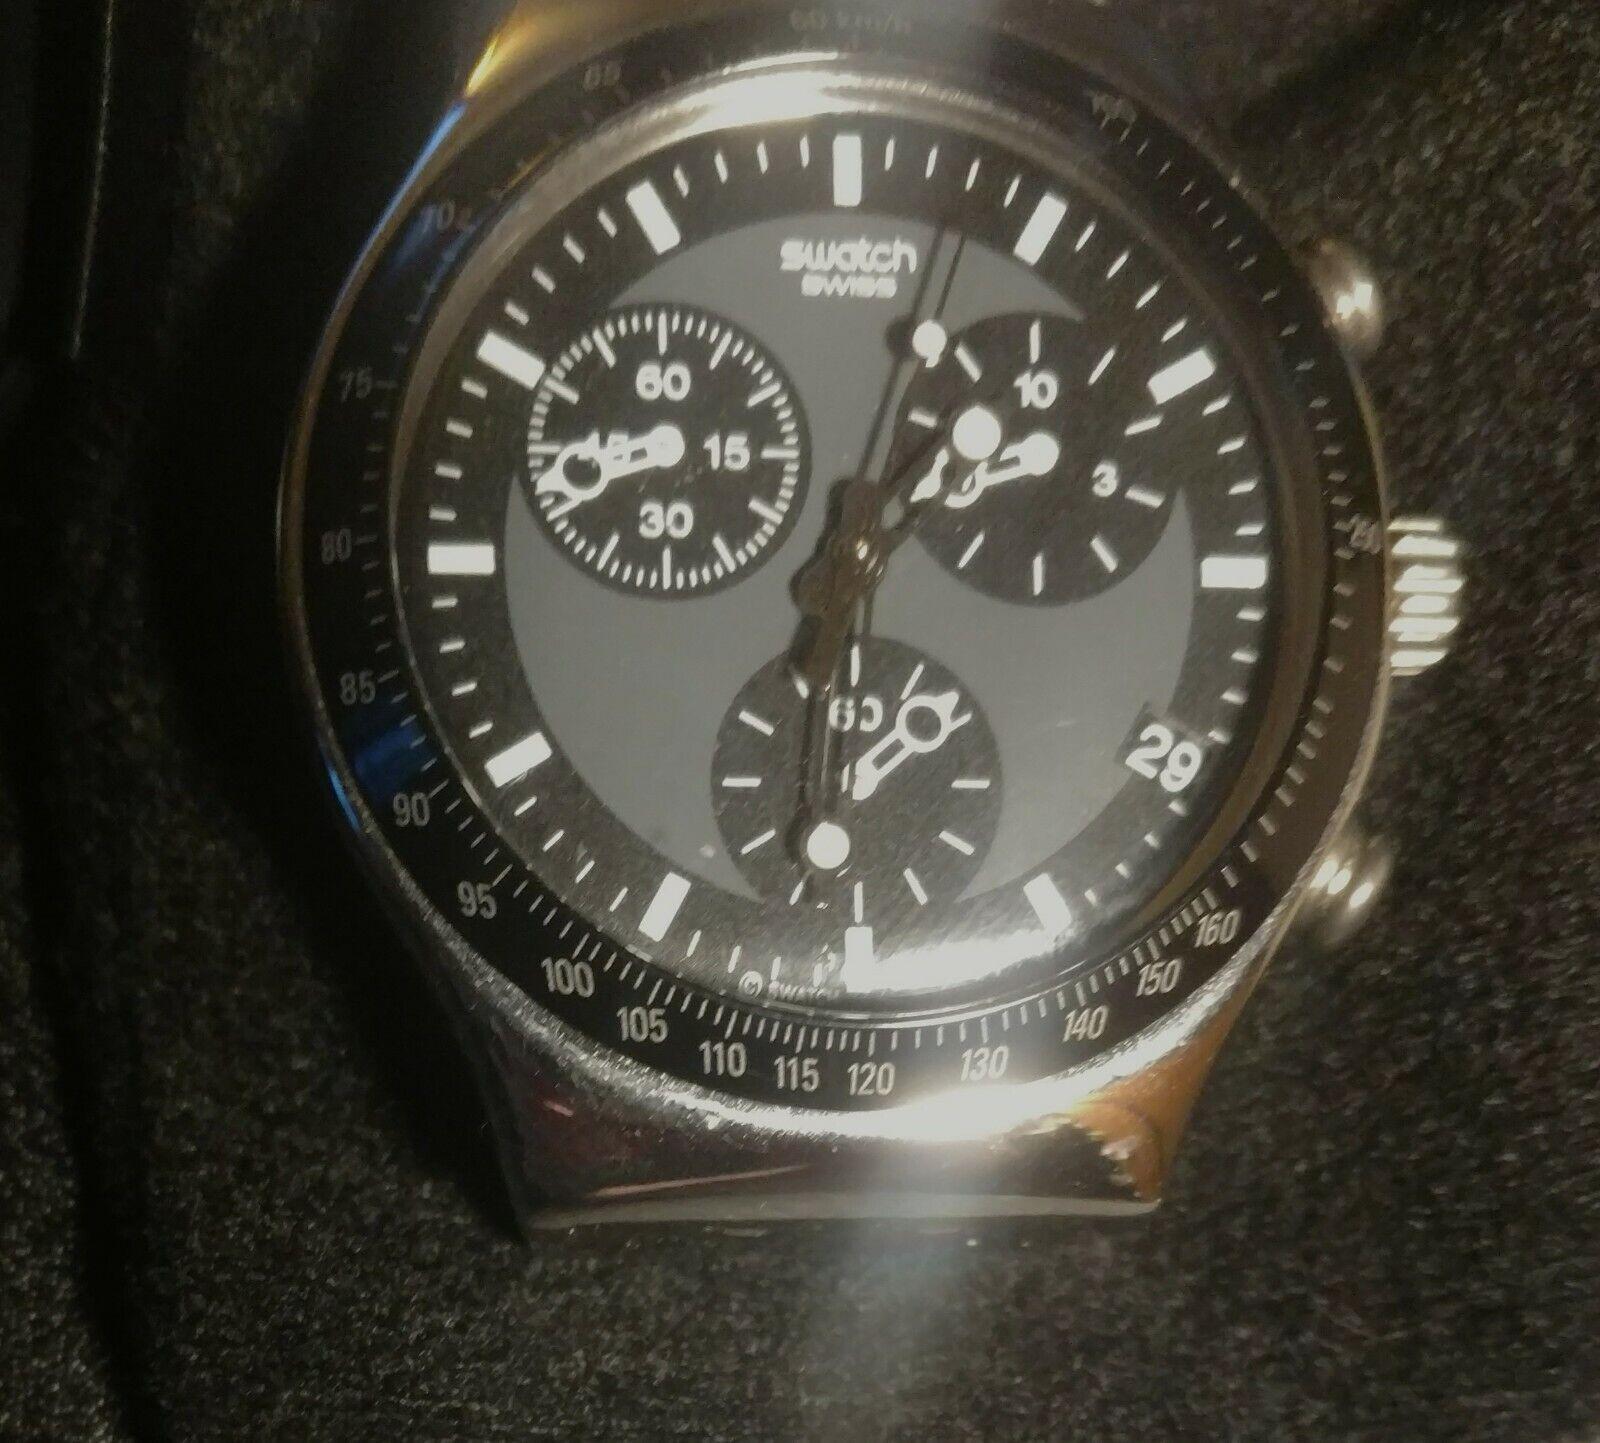 Swatch Irony Chronograph Windfall Mens Watch Ycs410gx For Sale Online Ebay